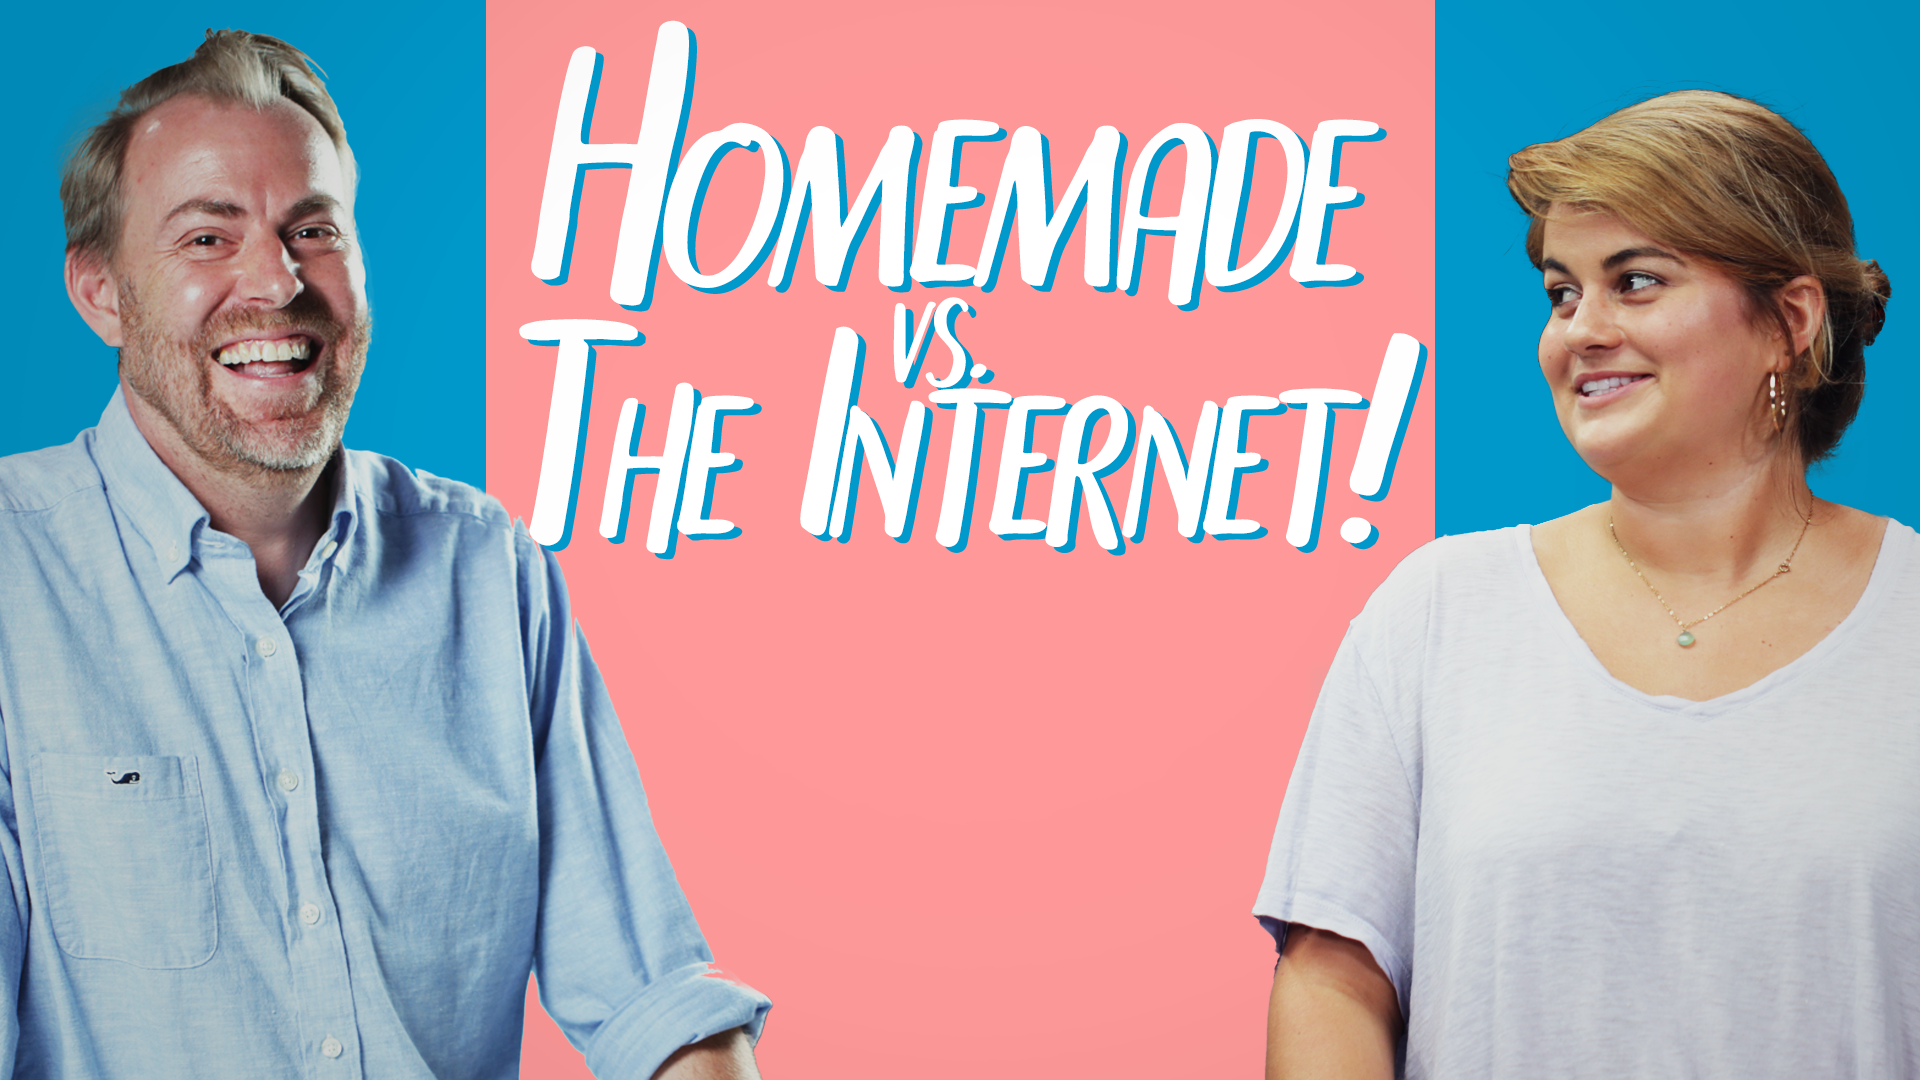 wd-homemamde-versus-the-internet-header-image